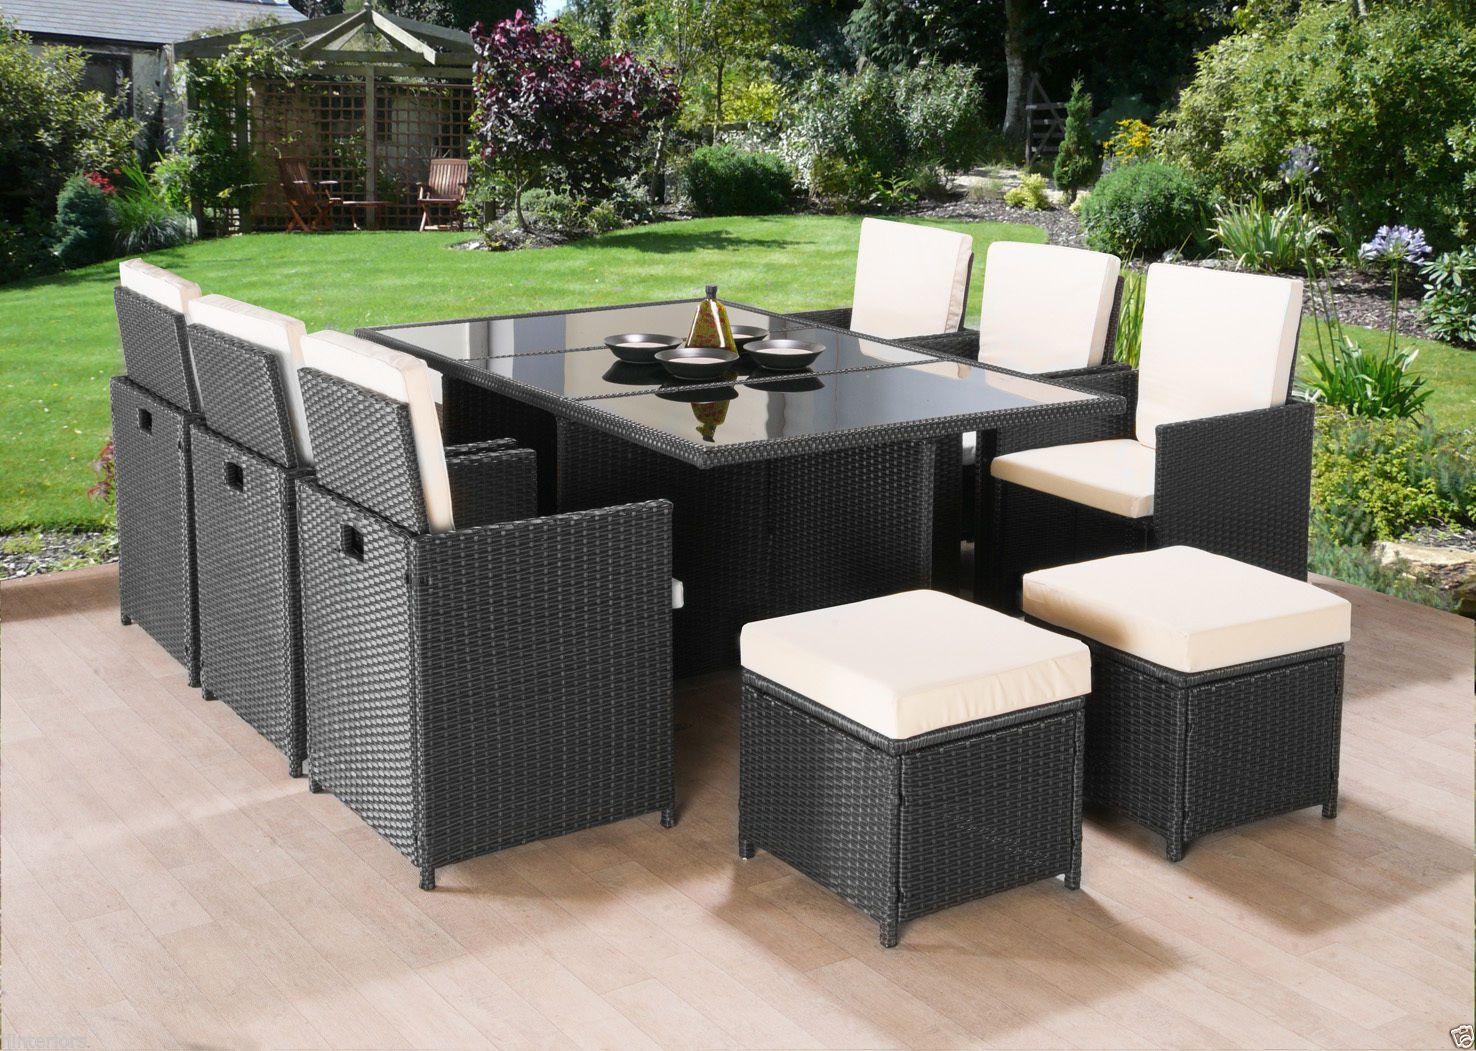 11 Piece Rattan Garden Furniture Set Priced To Clear Immediately